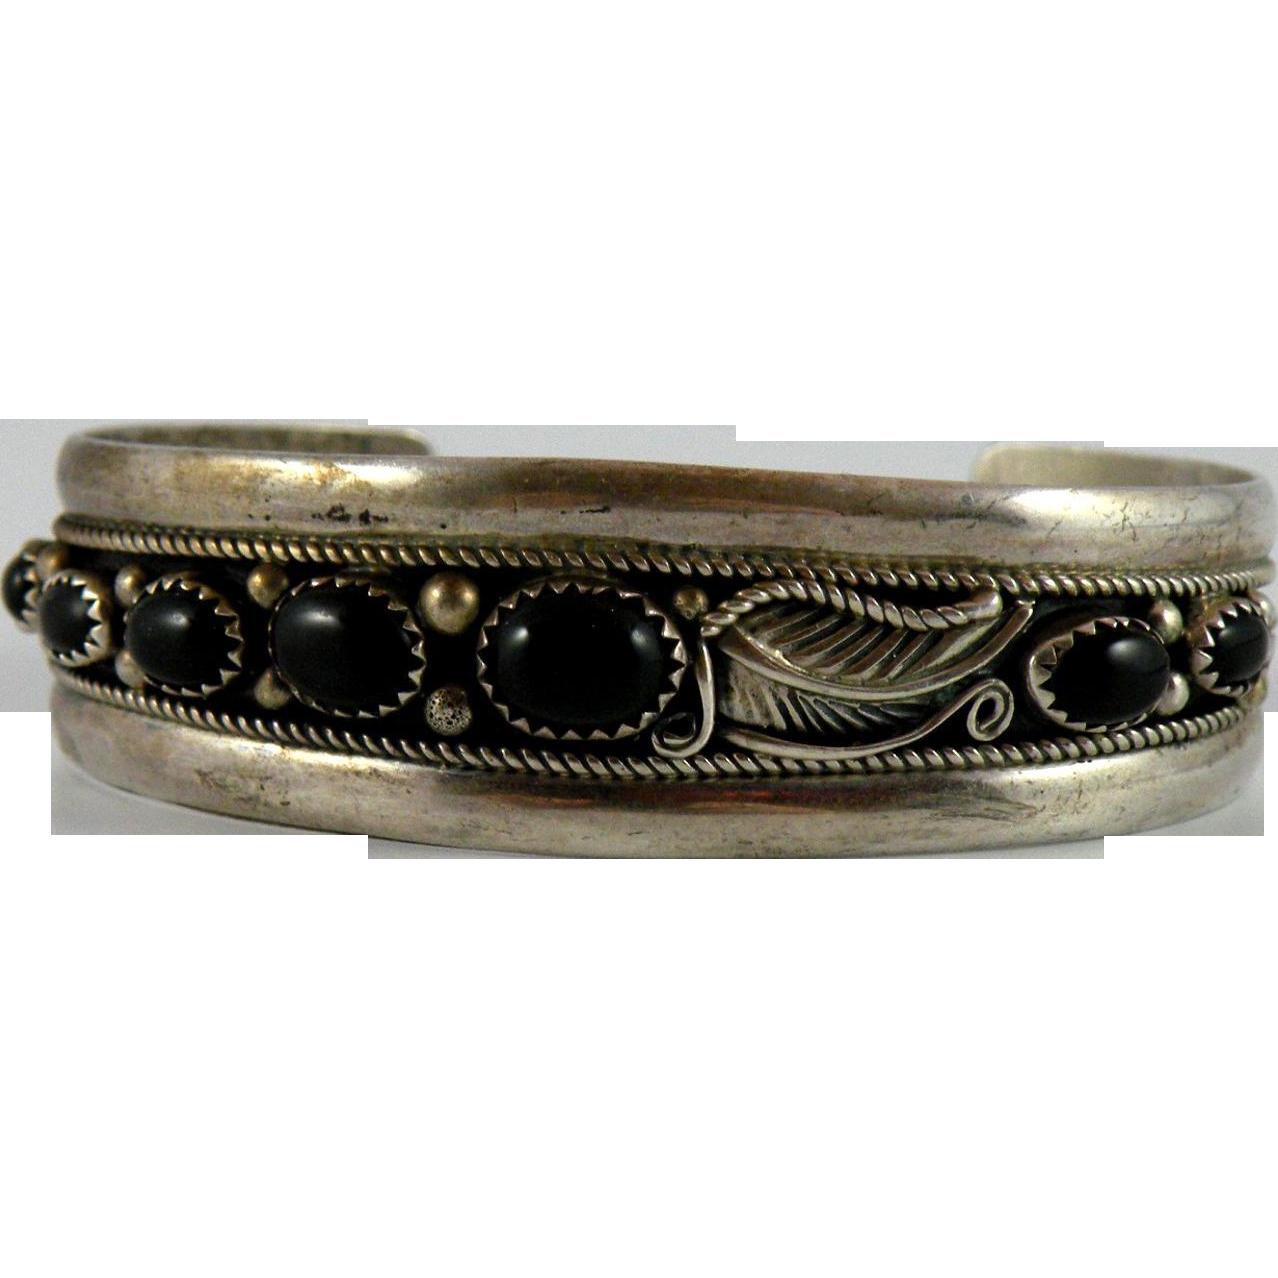 Ella Cowboy Navajo Silver Cuff Bracelet with Onyx